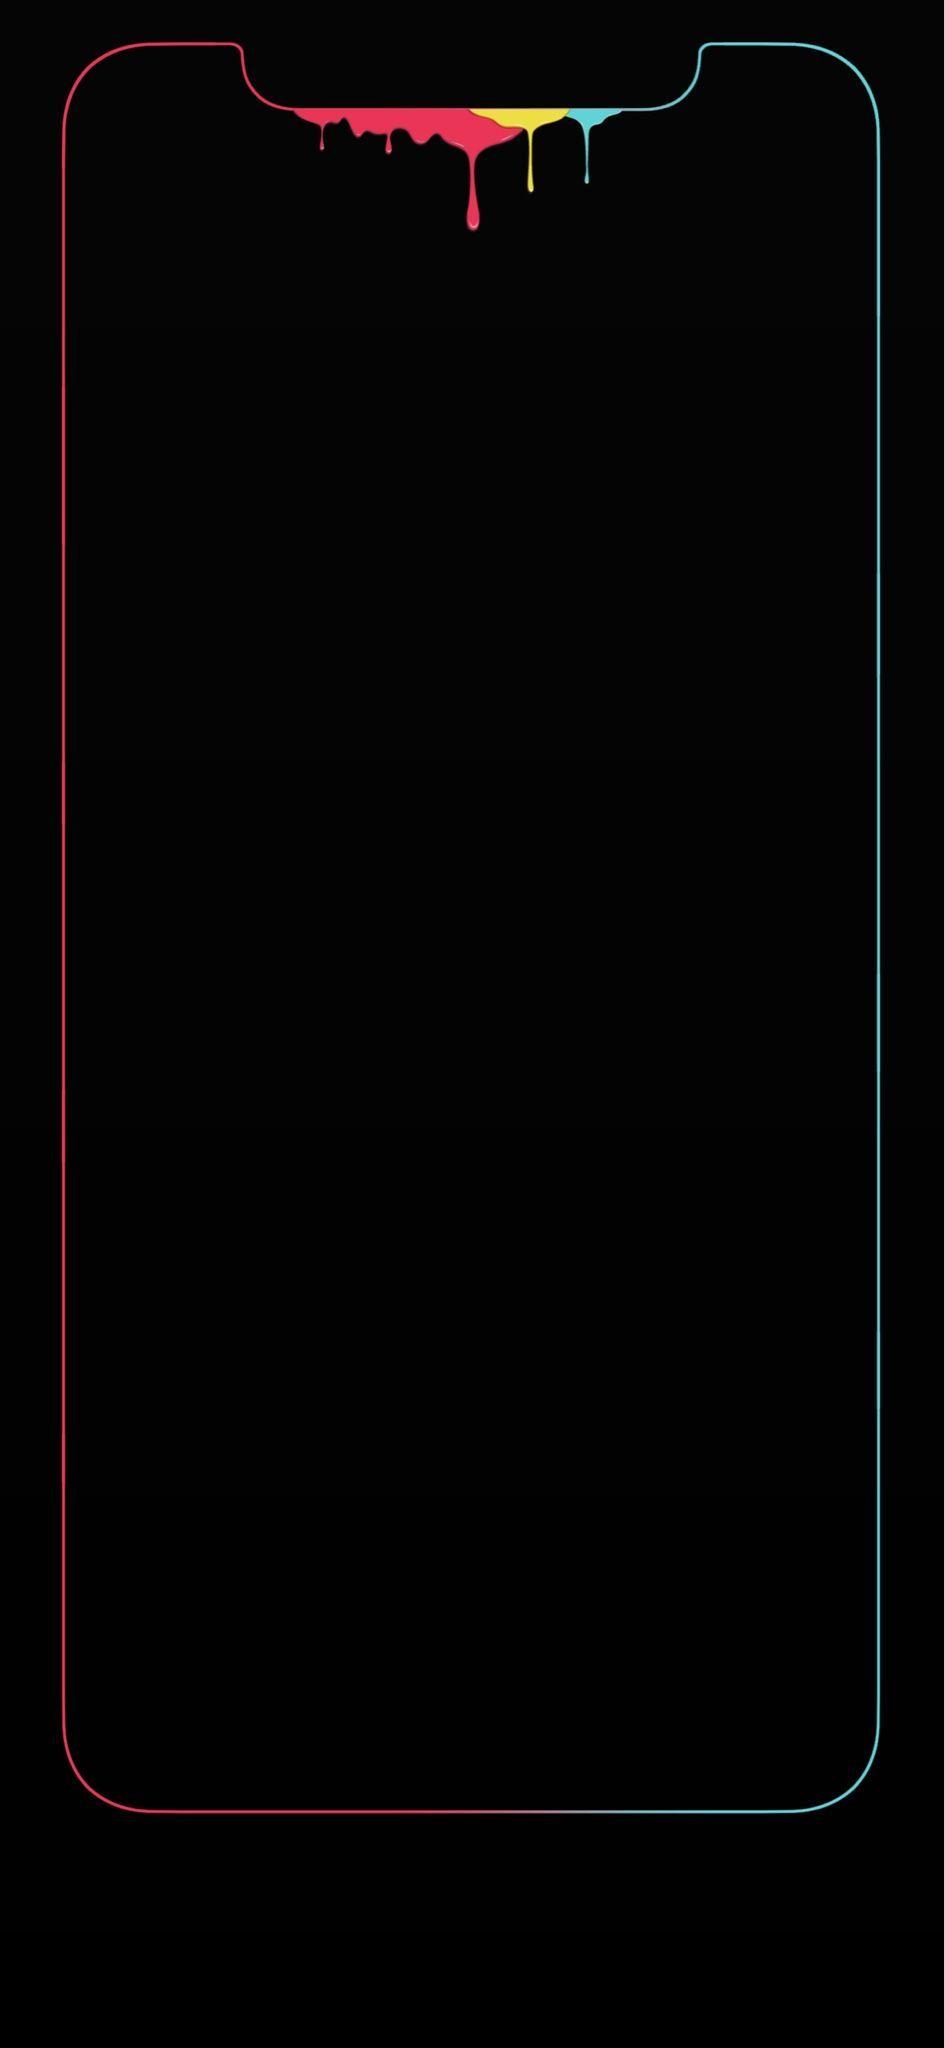 Wallpaper Iphone Dark - Wallpaper Iphone Dark